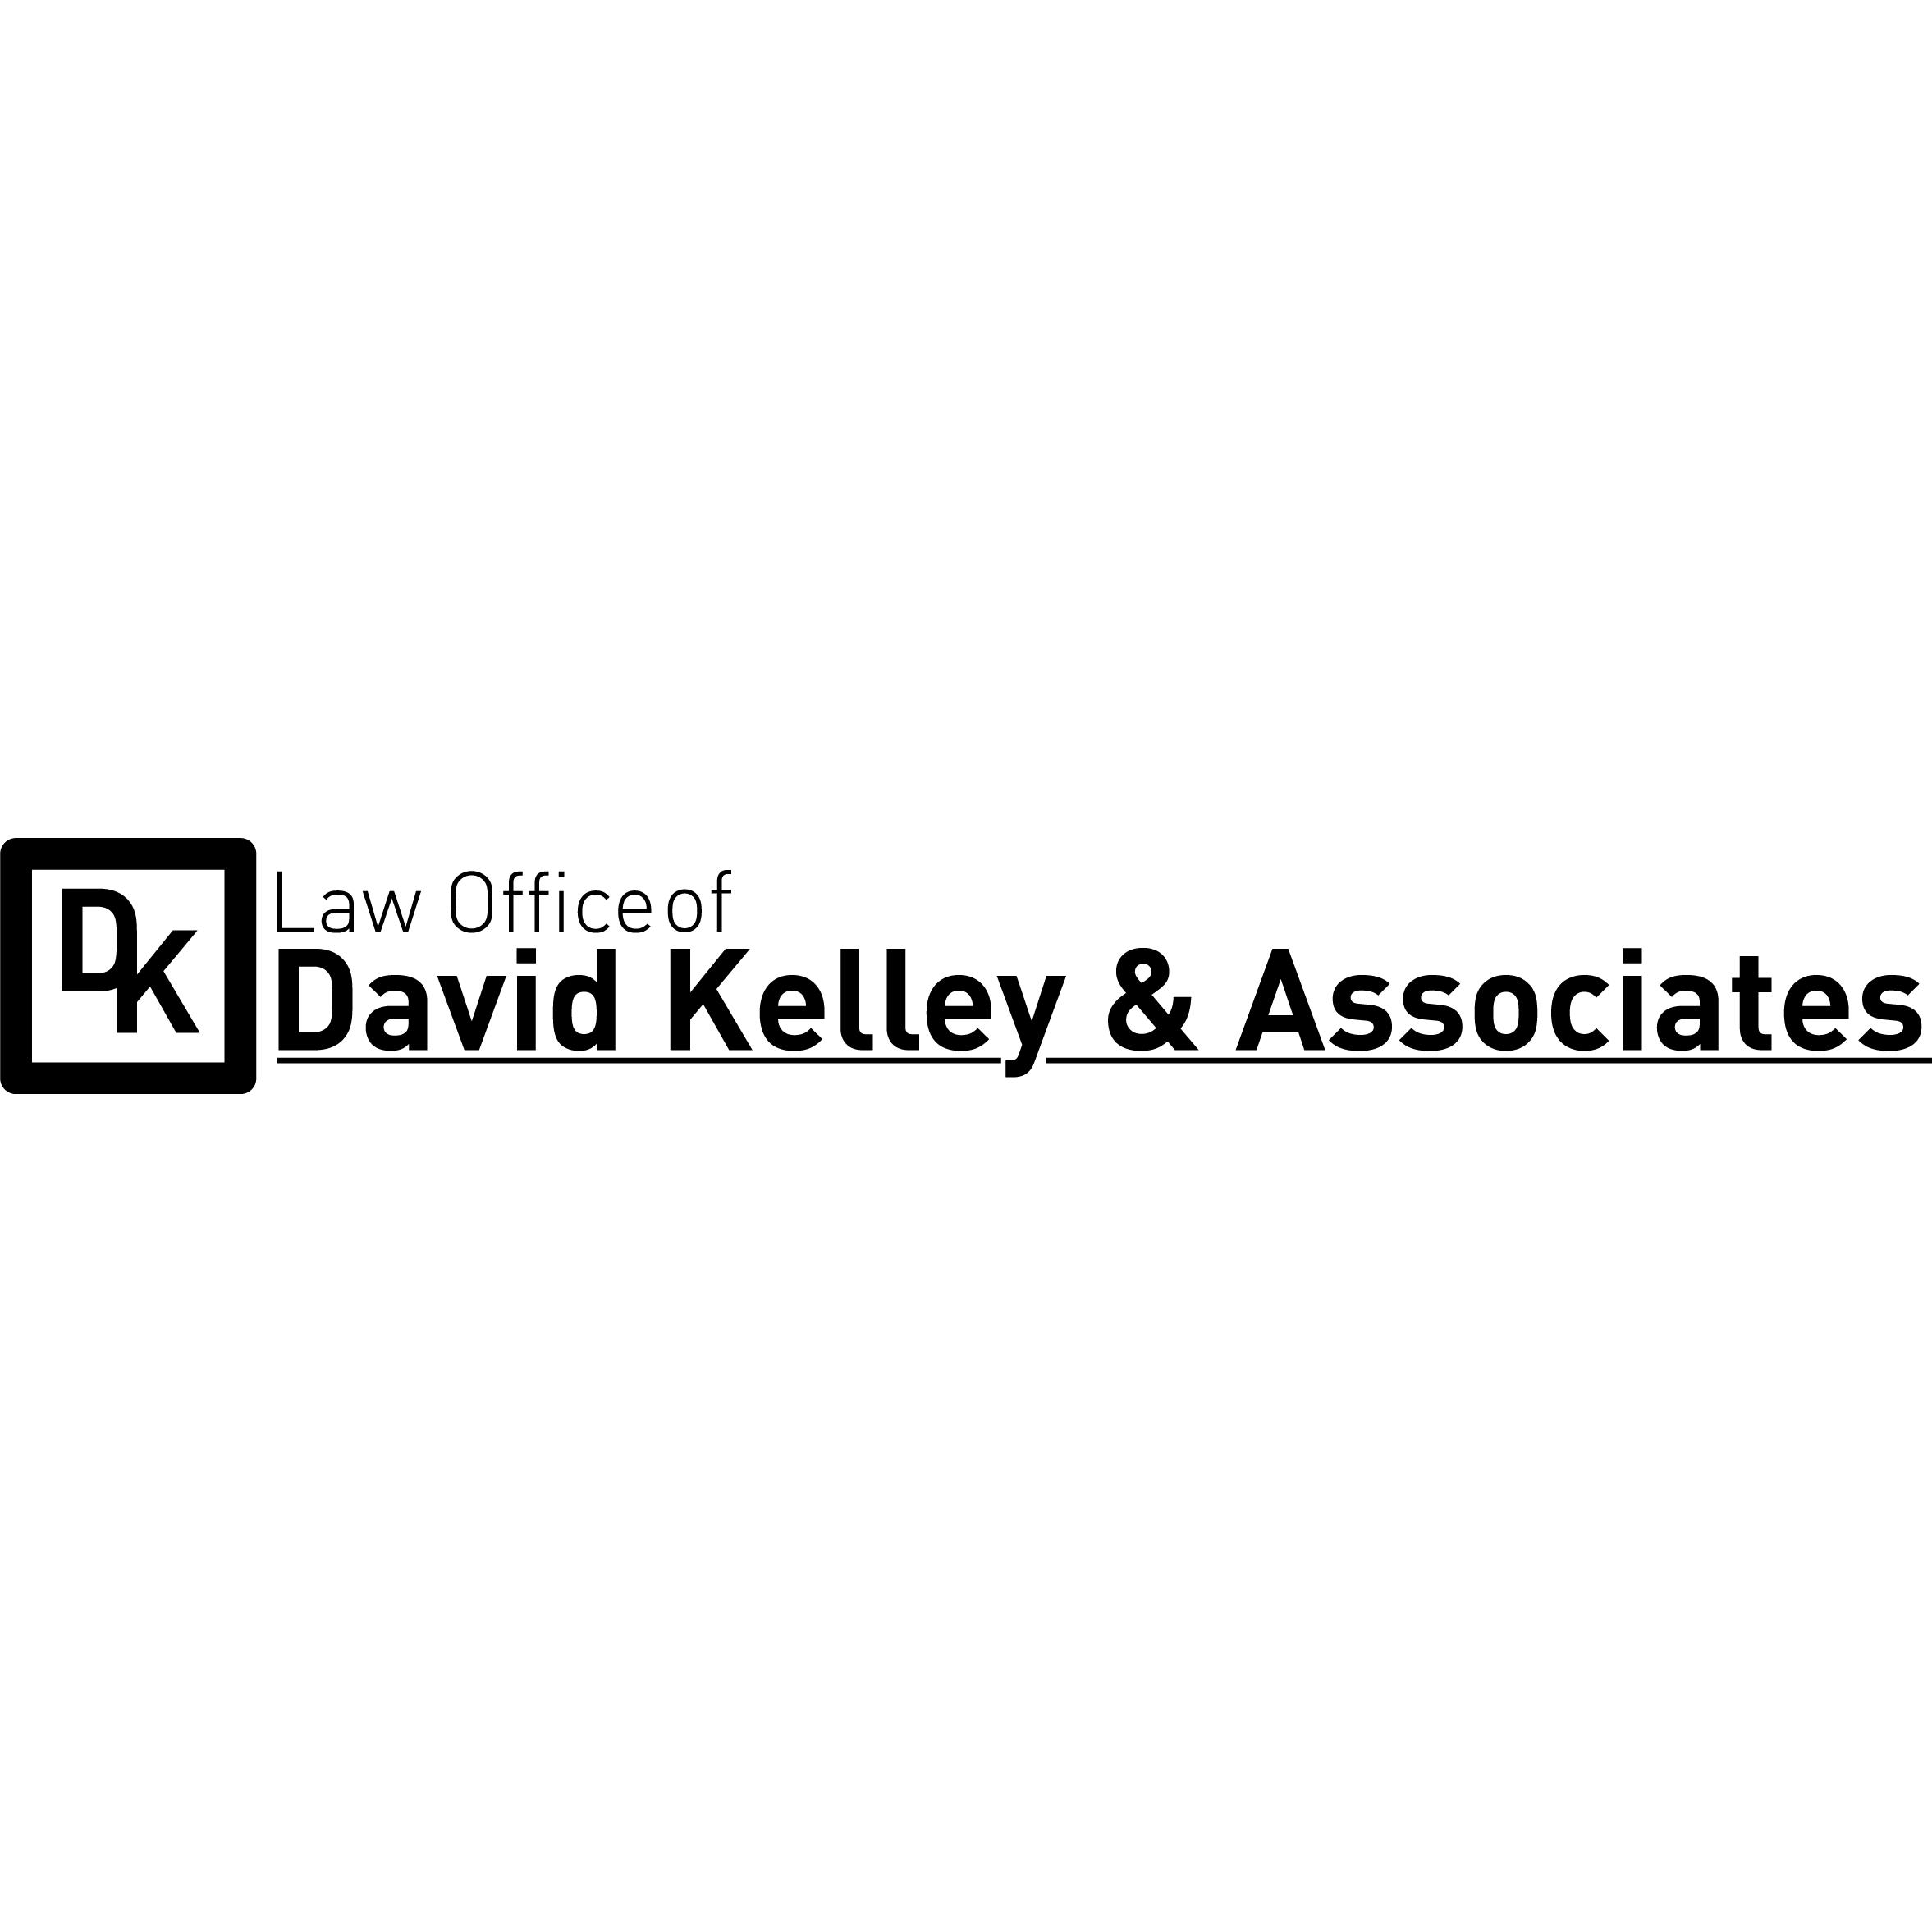 Law Office of David E. Kelley & Associates